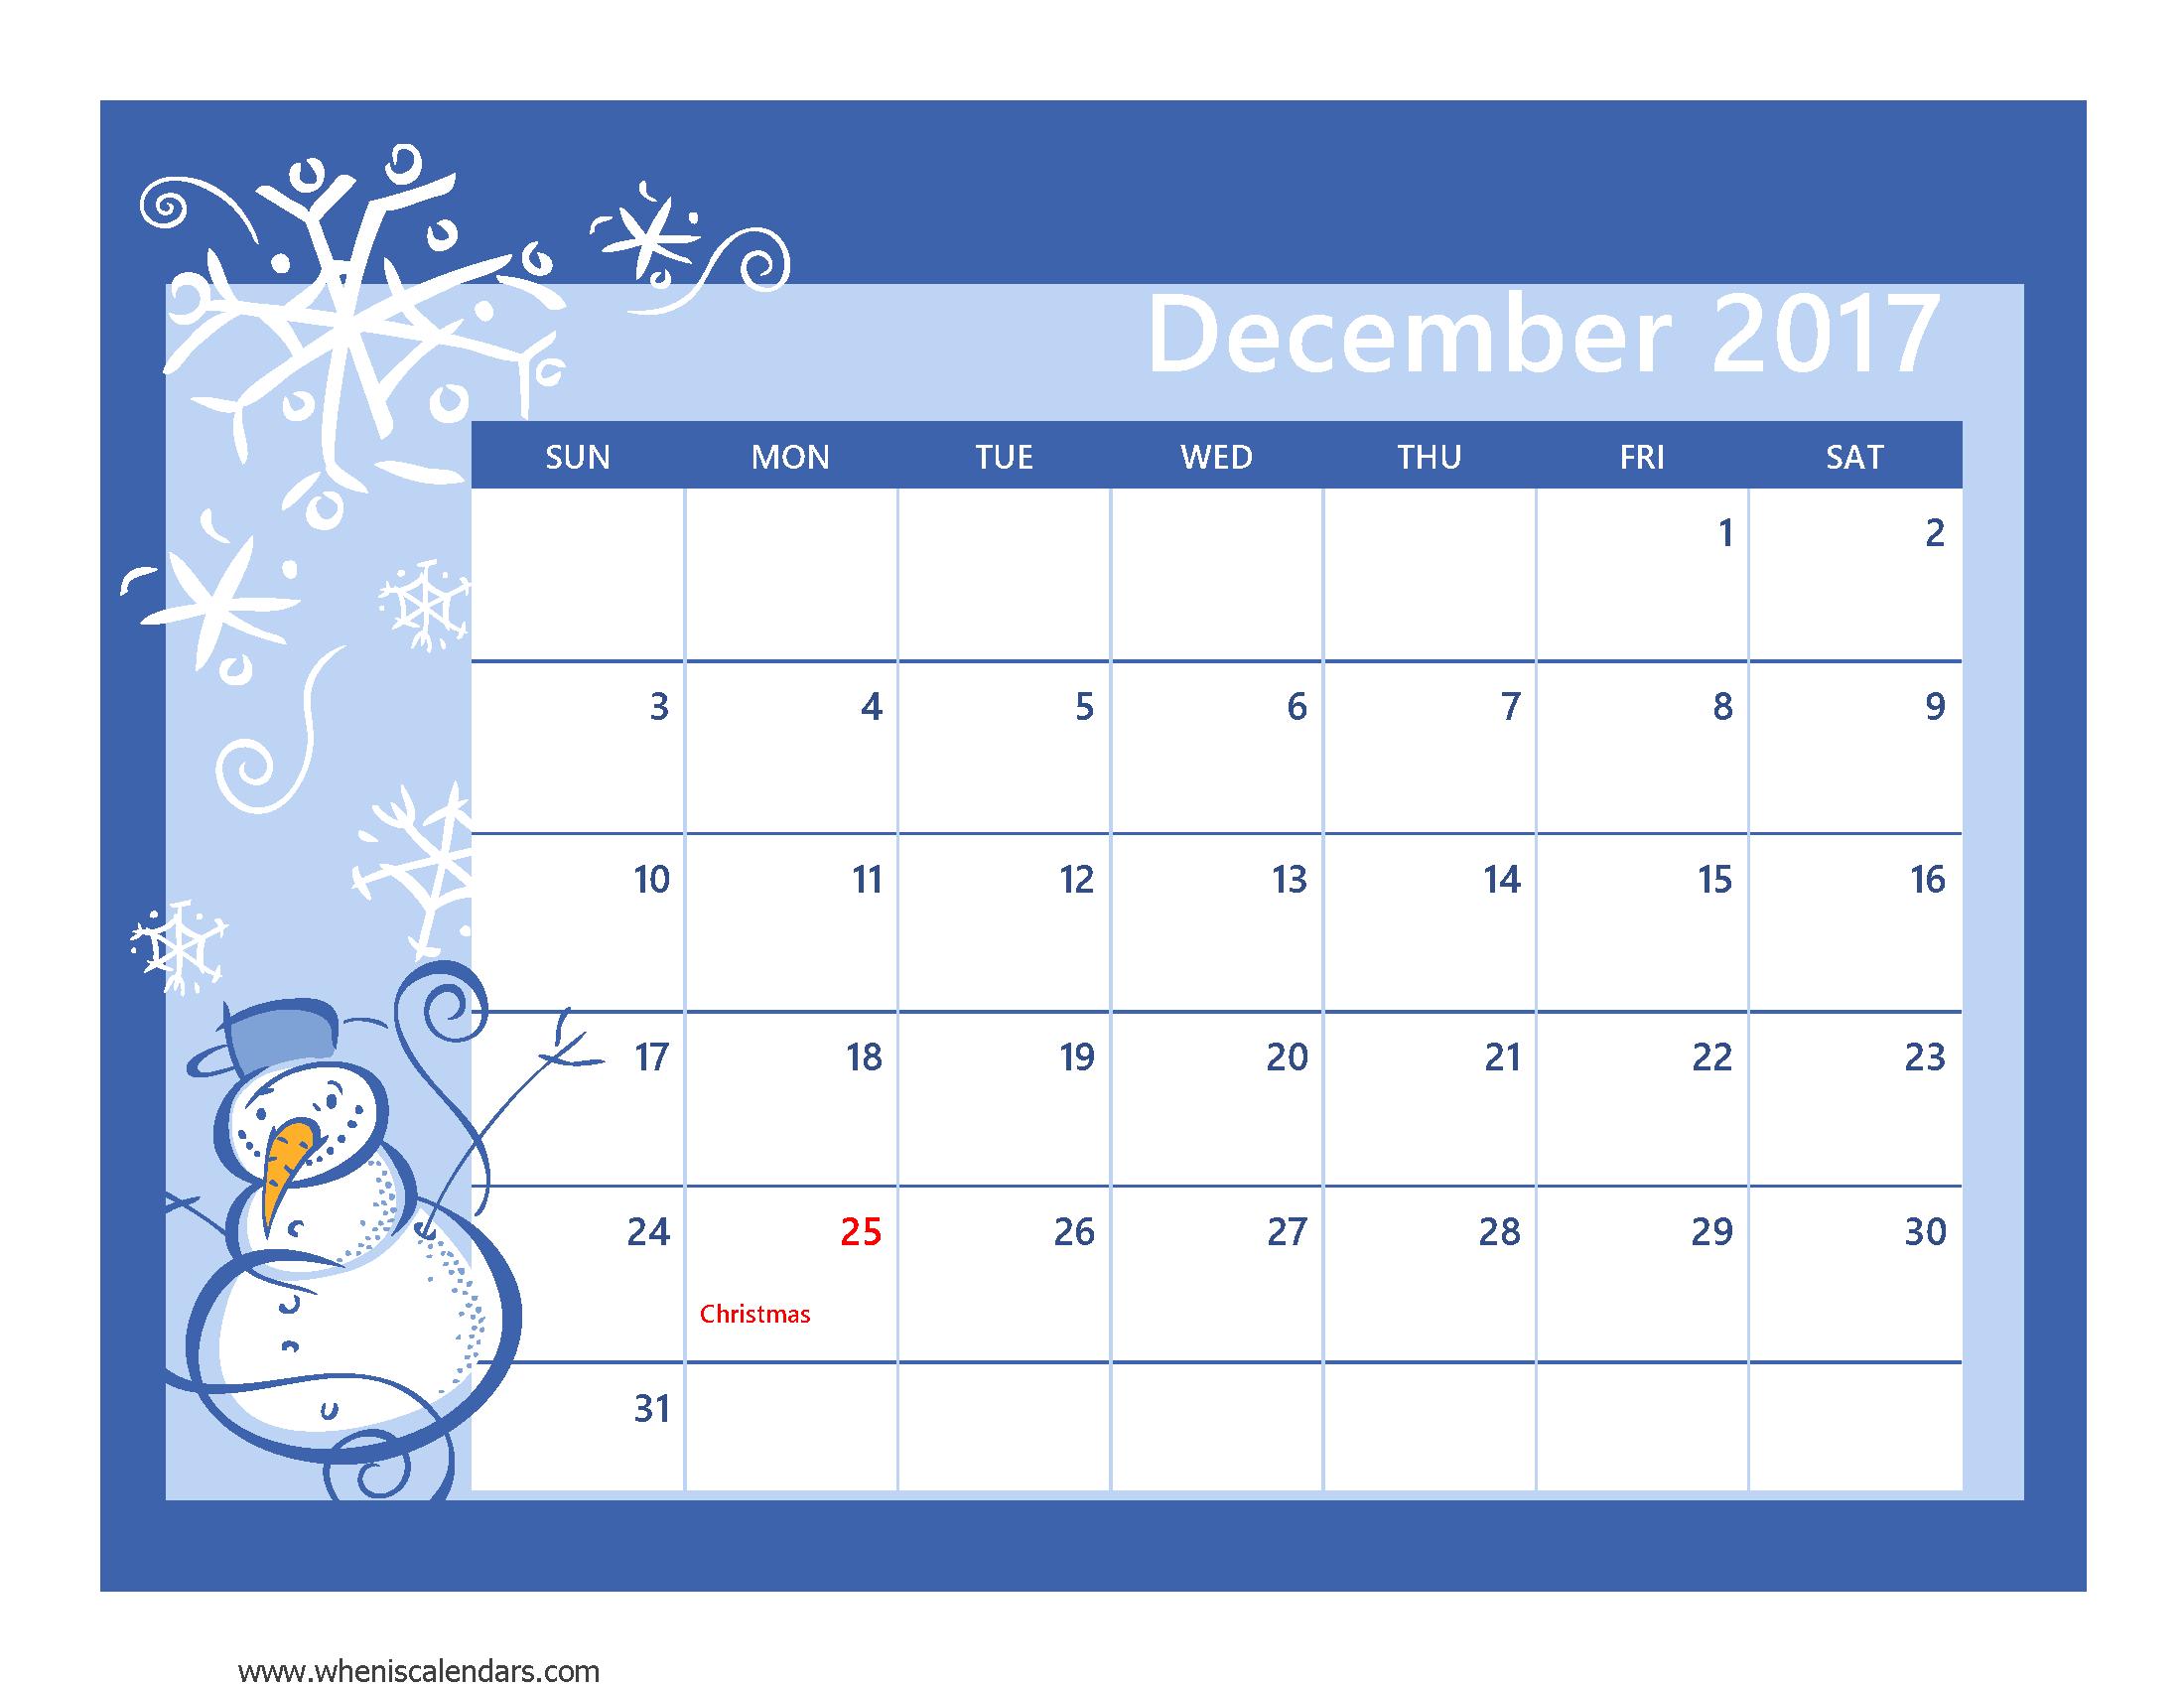 2017 Calendar Printable With Holidays December 2017 Calendar